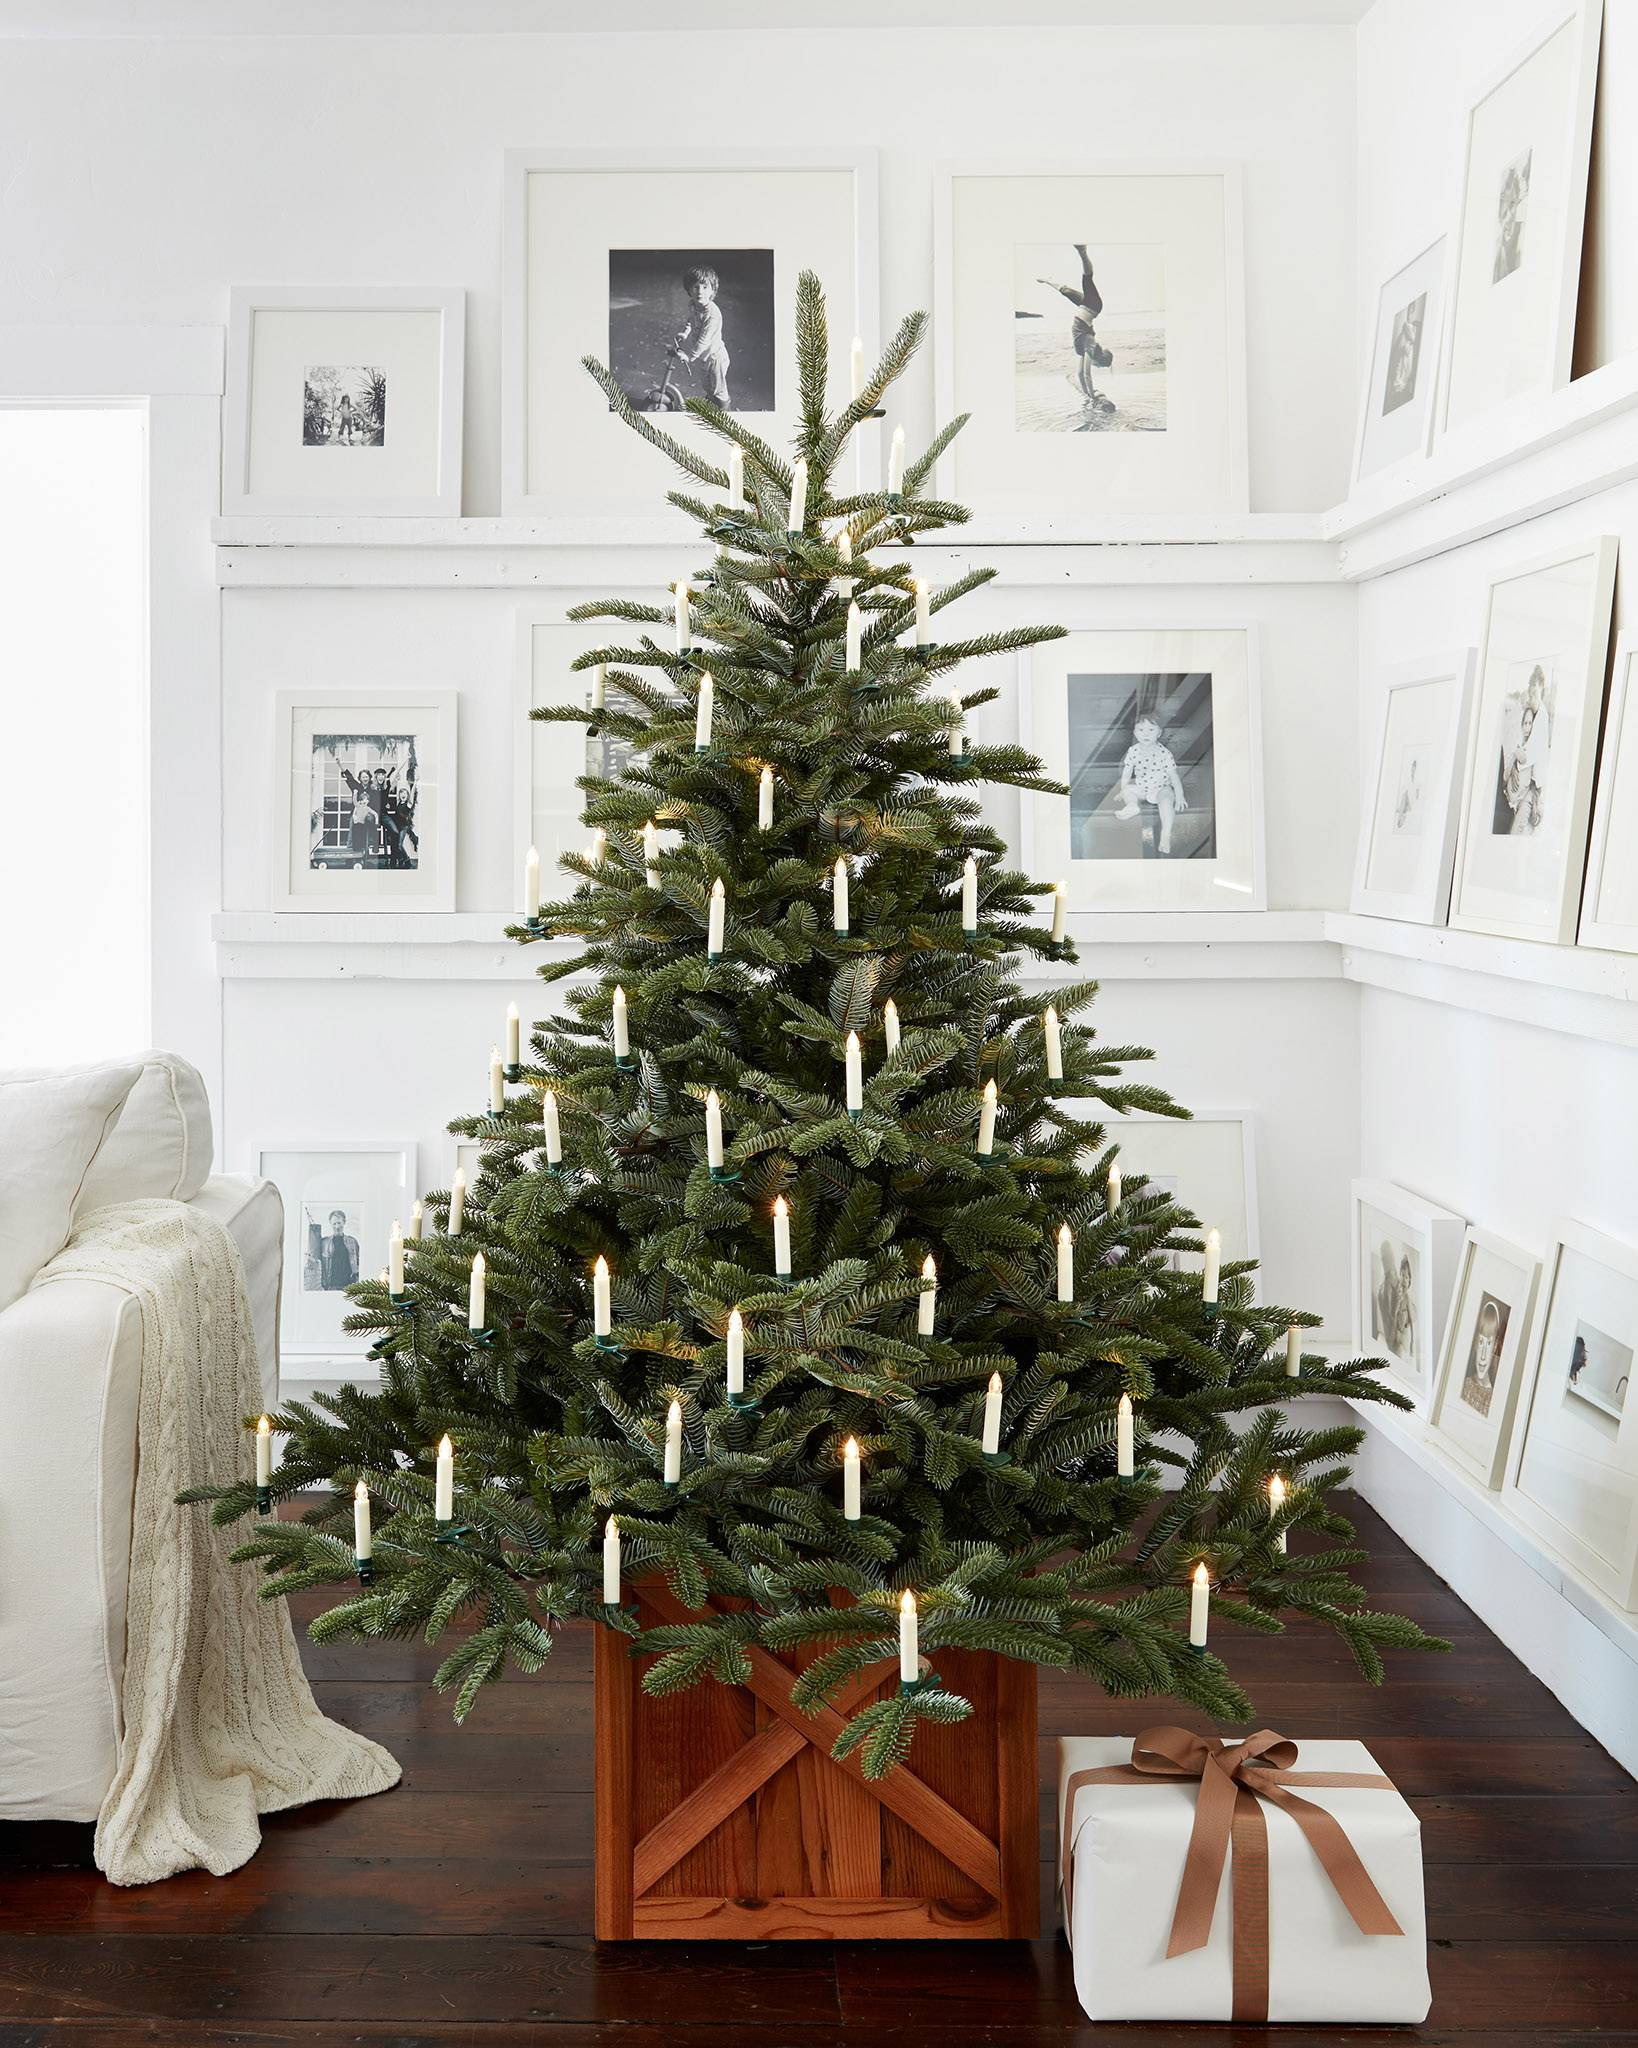 european fir artificial christmas tree by balsam hill in home image - European Christmas Tree